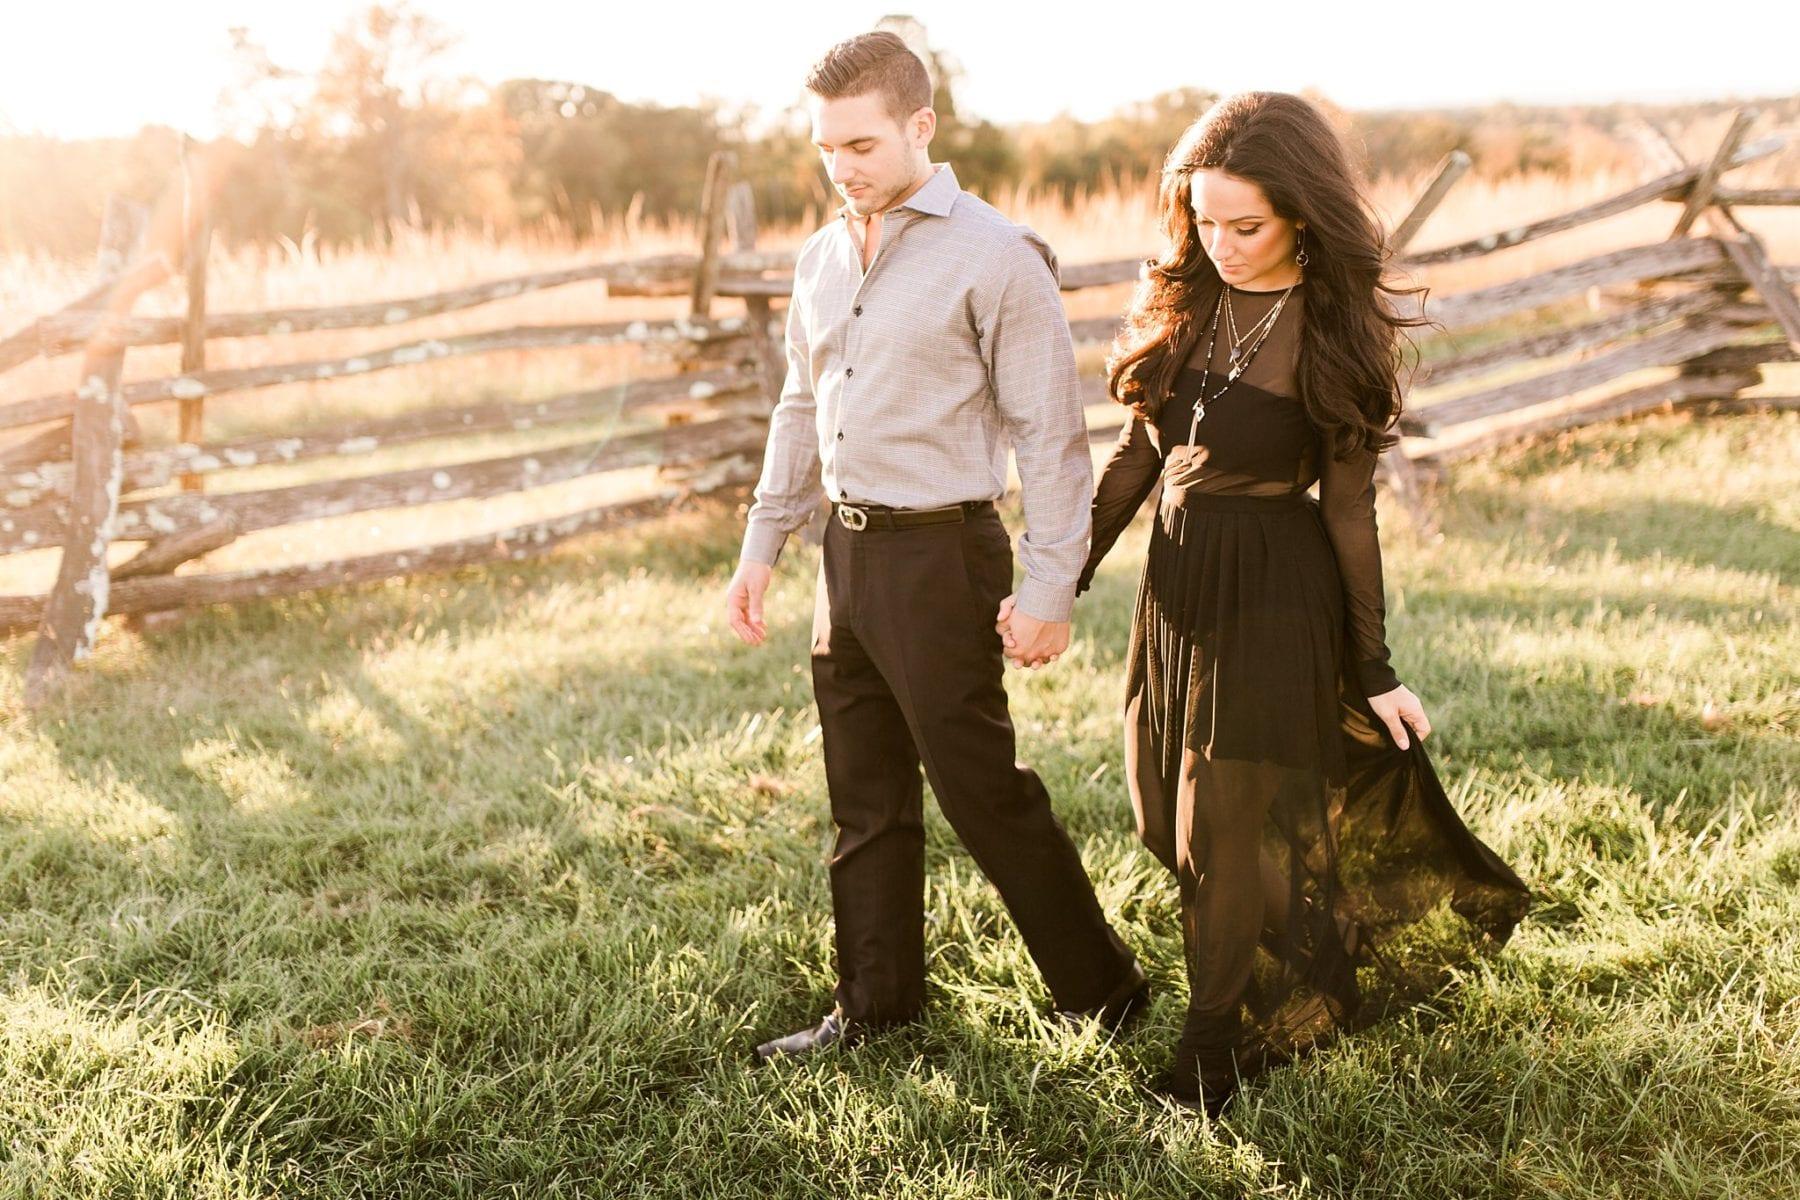 Manassas Battlefield Portraits Virginia Wedding Photographer Megan Kelsey Photography Lianne & Chris-140.jpg